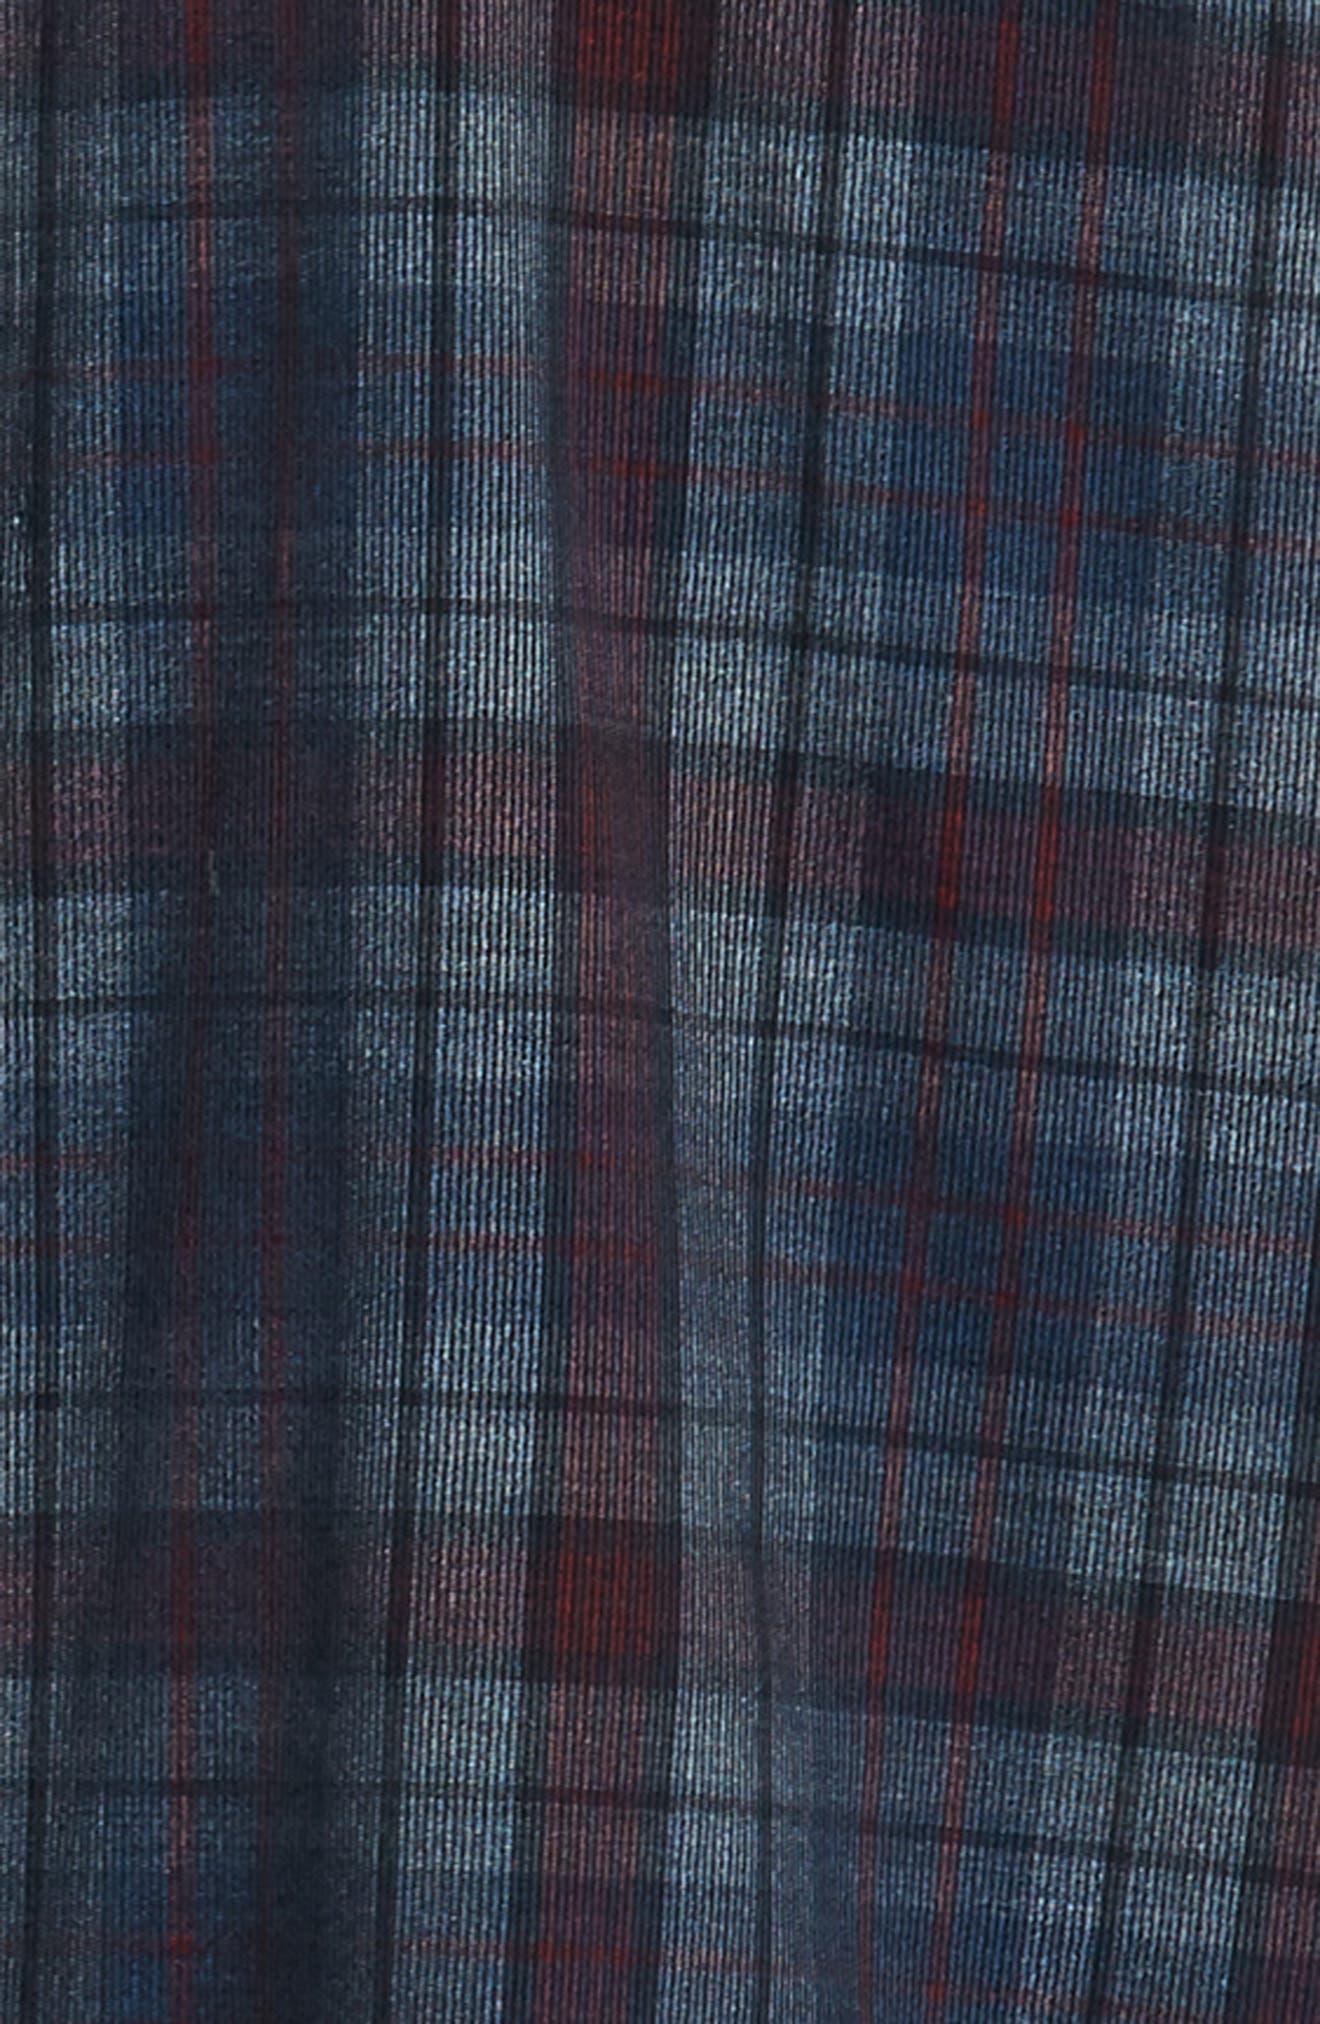 Lemke Regular Fit Corduroy Sport Shirt,                             Alternate thumbnail 6, color,                             NAVY